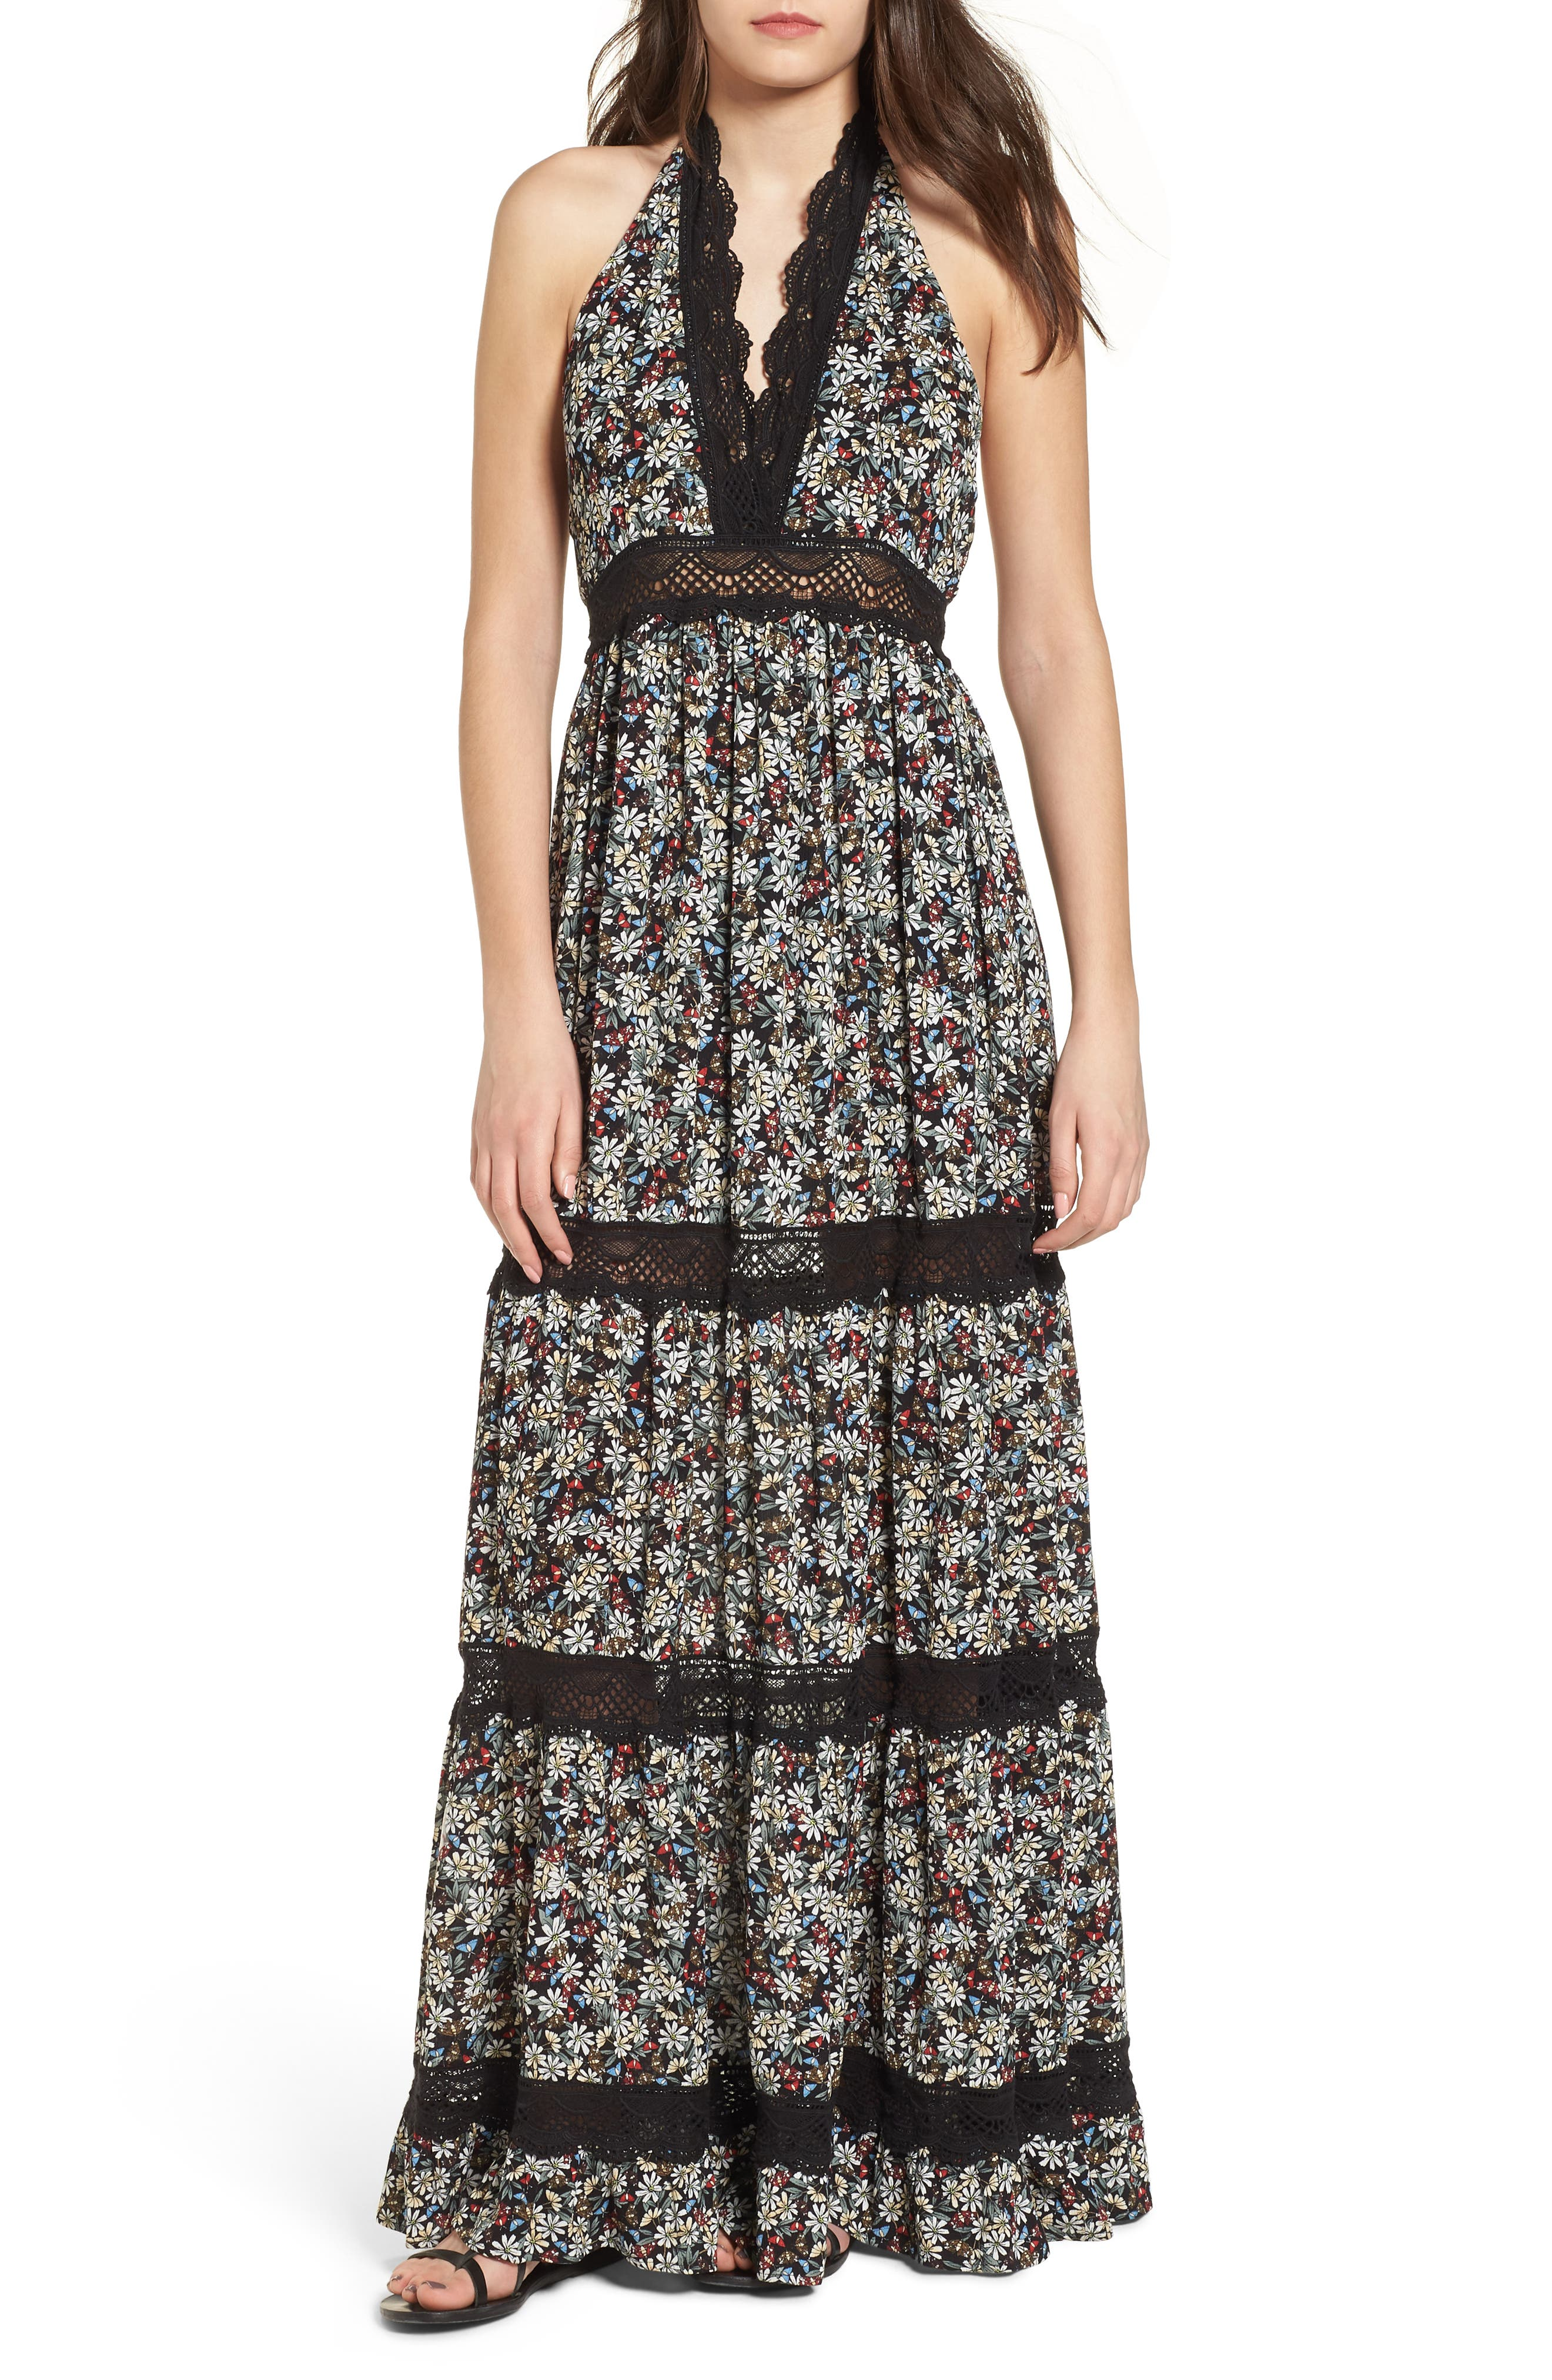 Flora Halter Neck Maxi Dress,                         Main,                         color, Multi Black